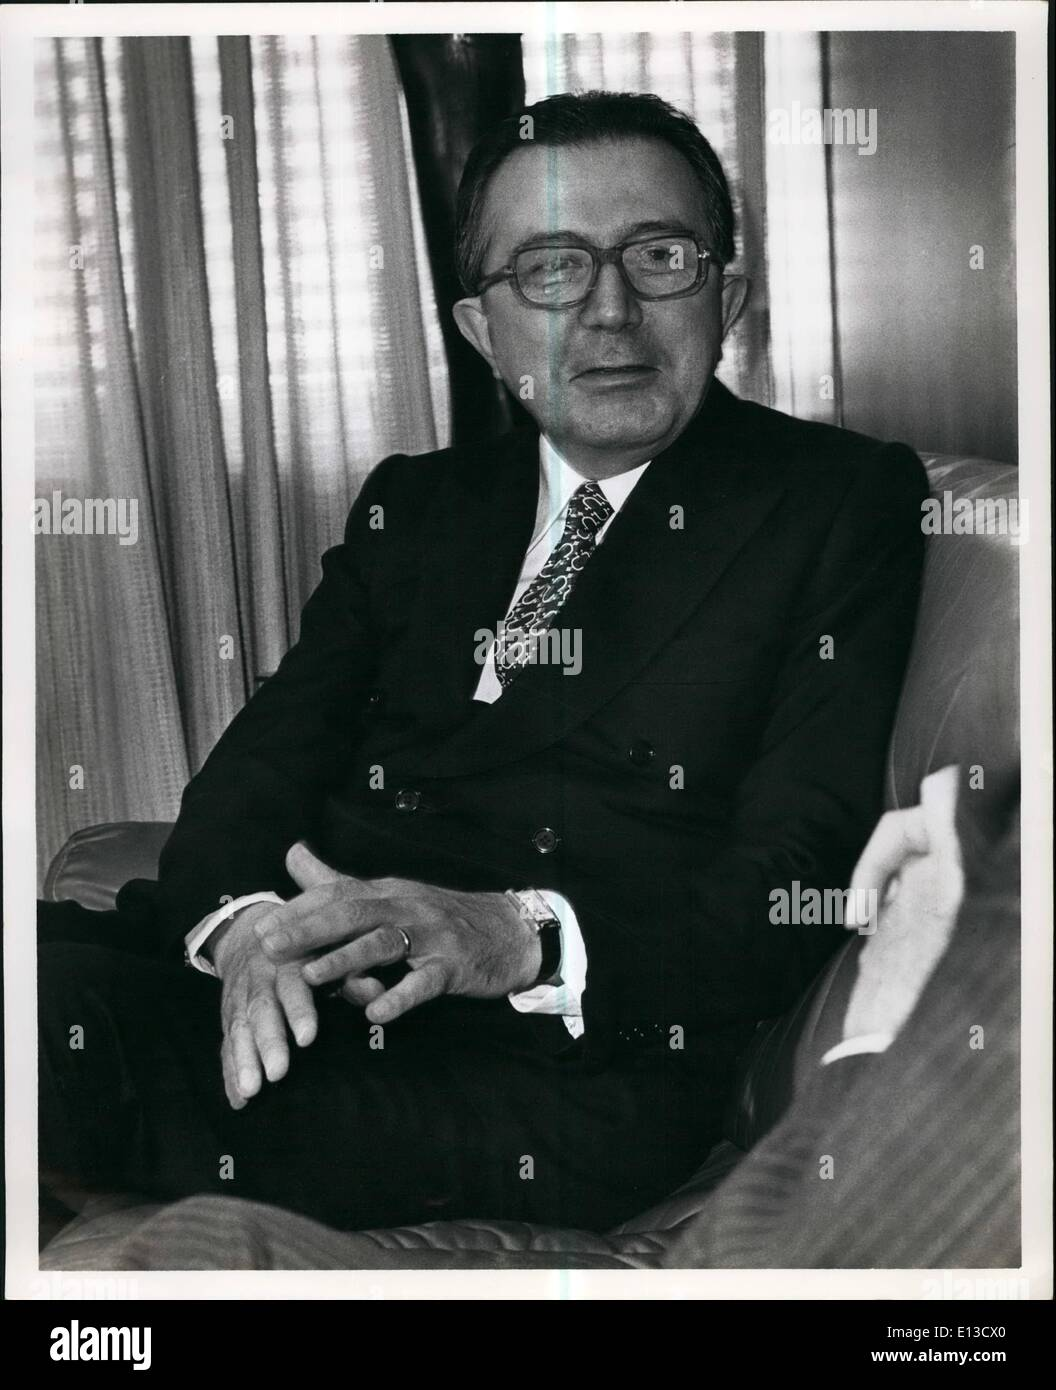 Feb. 29, 2012 - Italian Premier Giulio Andreott - Stock Image